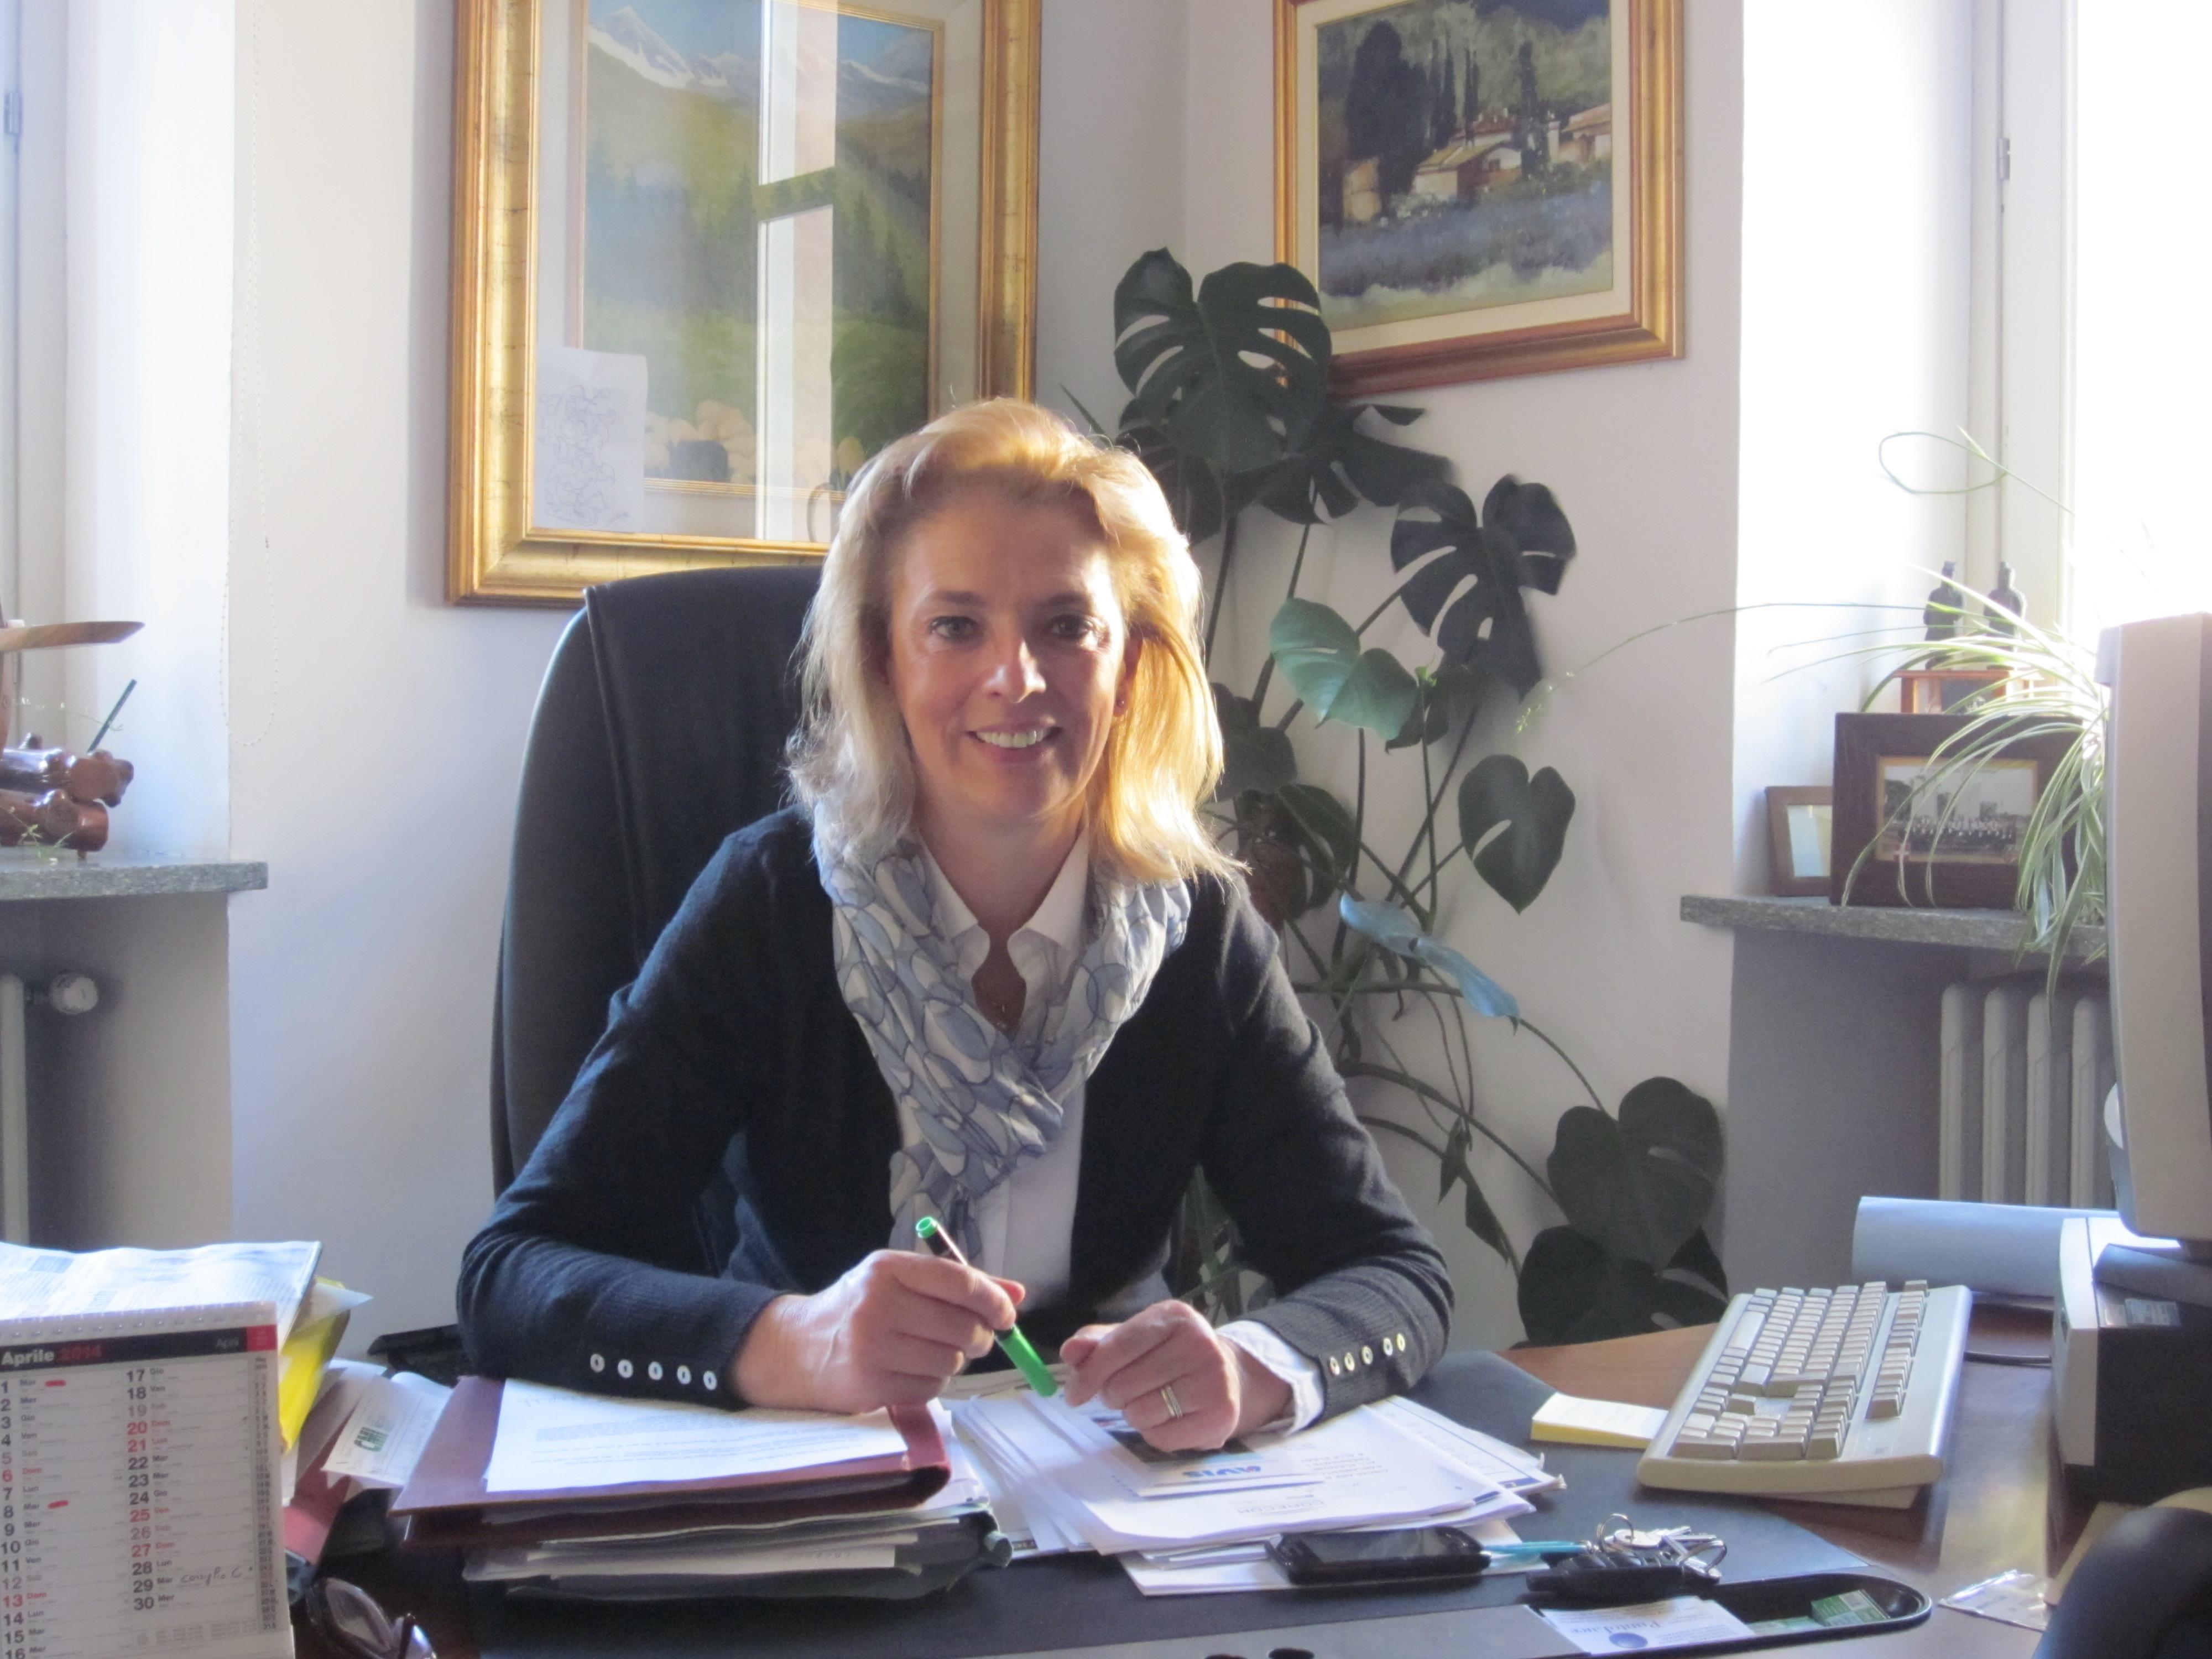 Anna Balangero